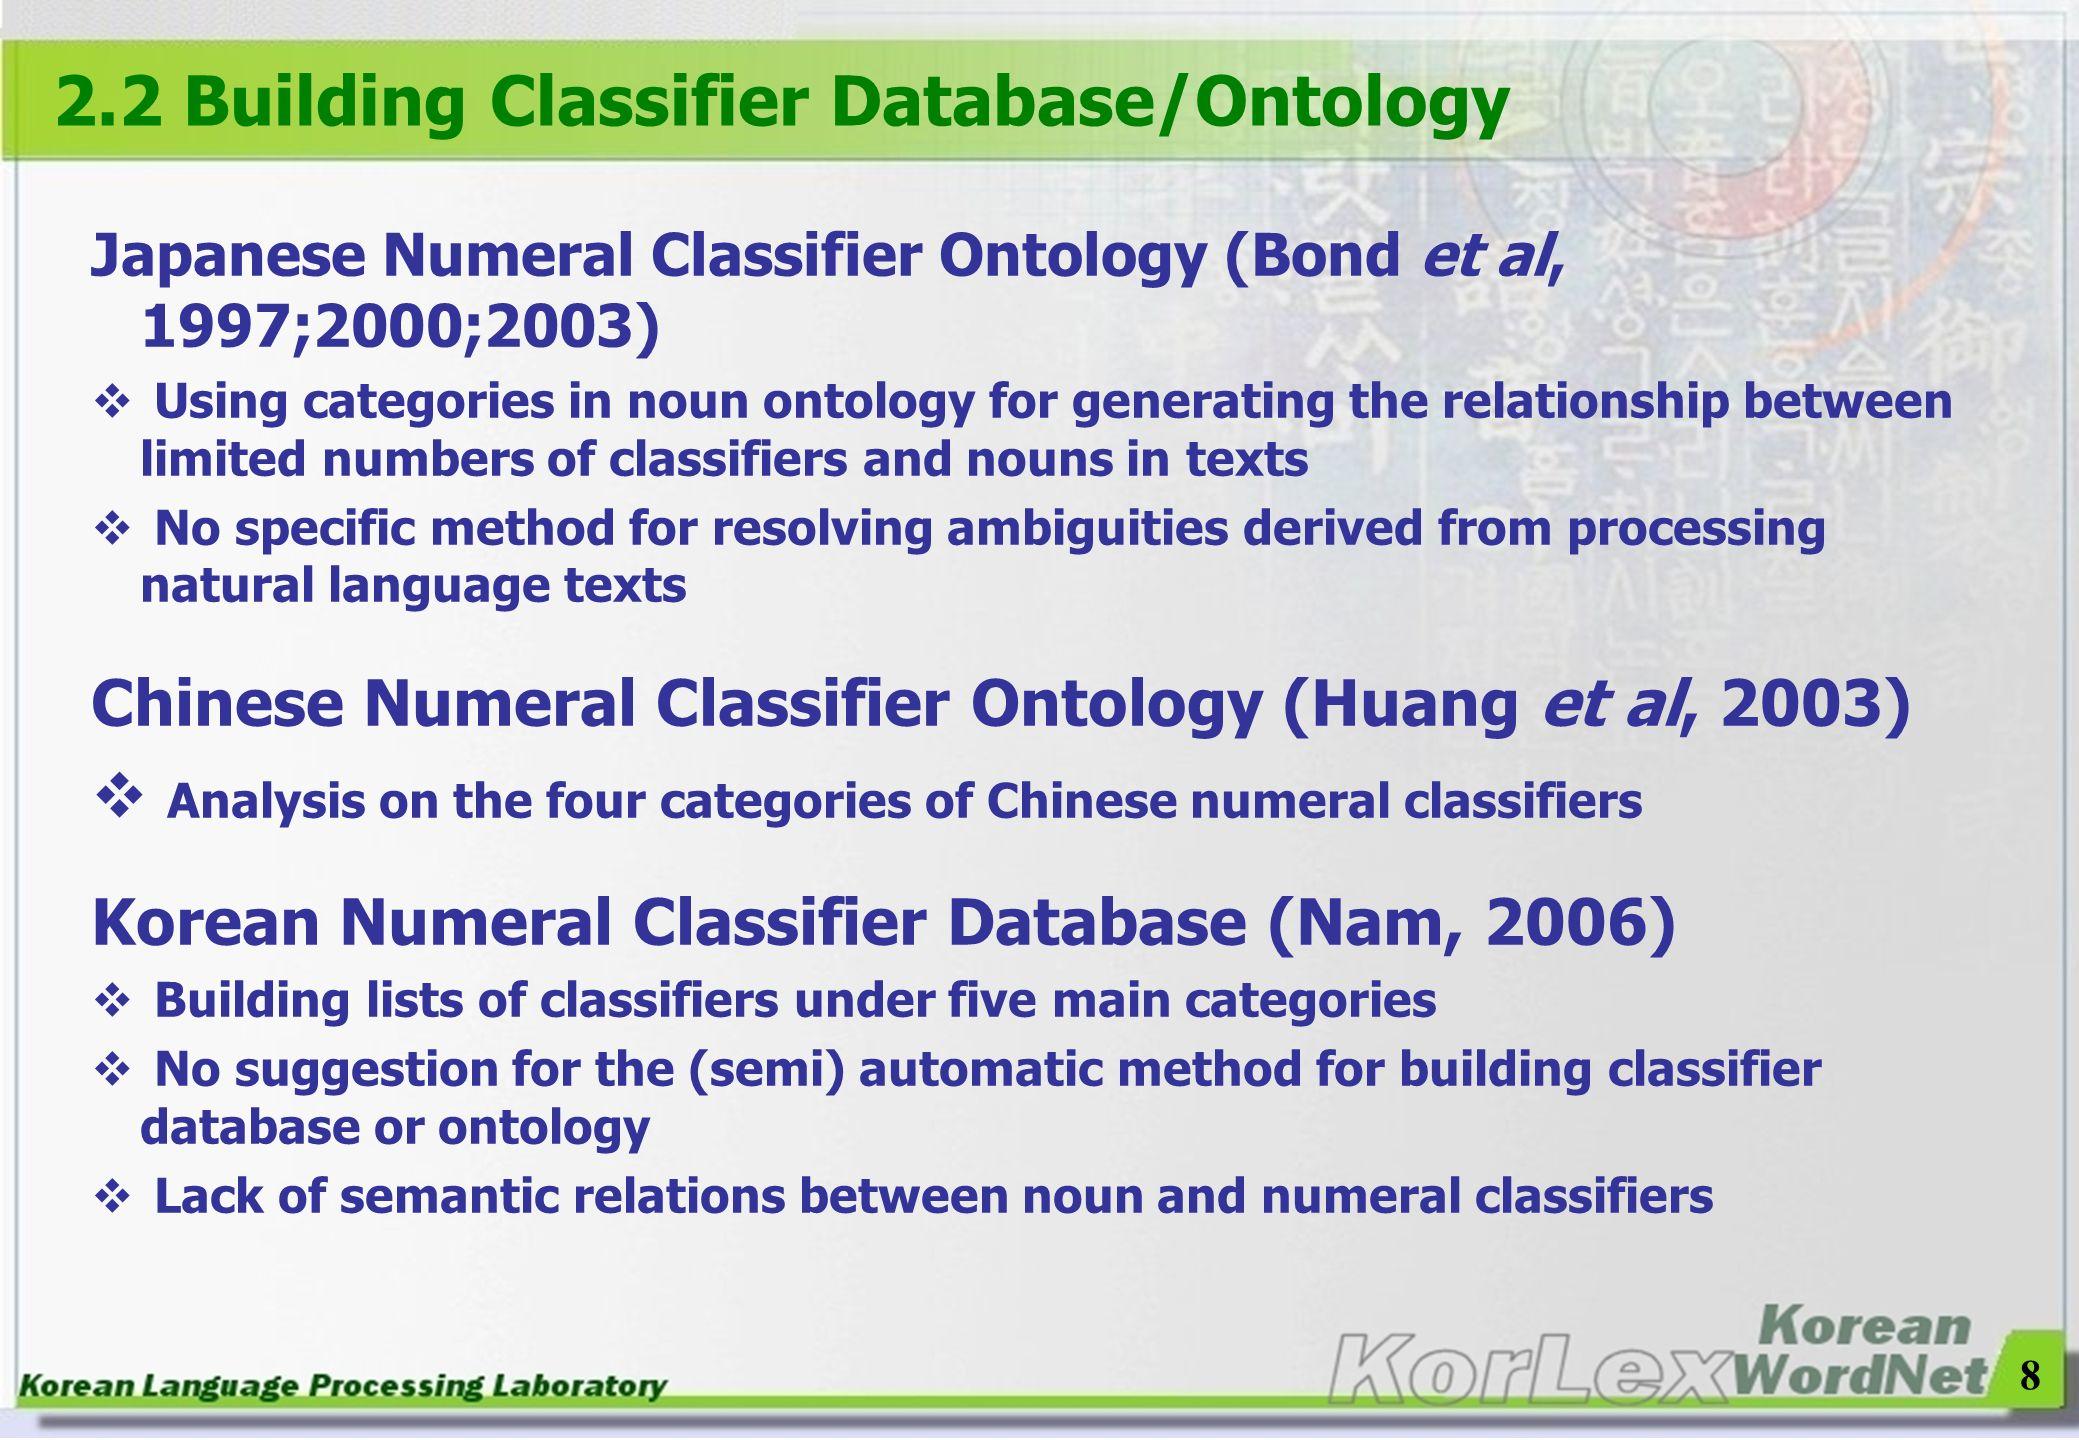 8 2.2 Building Classifier Database/Ontology Japanese Numeral Classifier Ontology (Bond et al, 1997;2000;2003) Using categories in noun ontology for ge